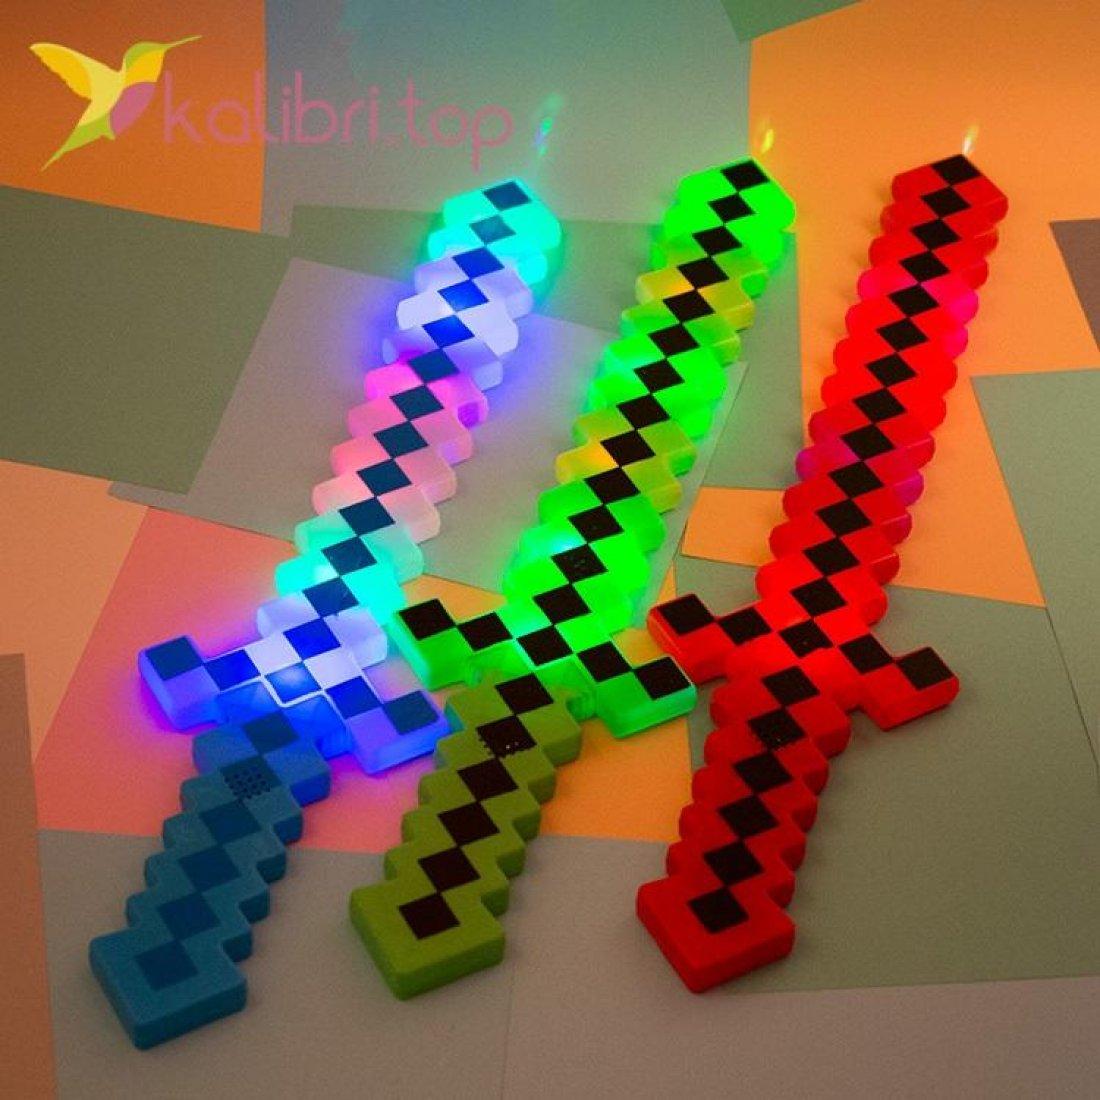 Меч Майнкрафт (Minecraft) светящийся оптом фото 2